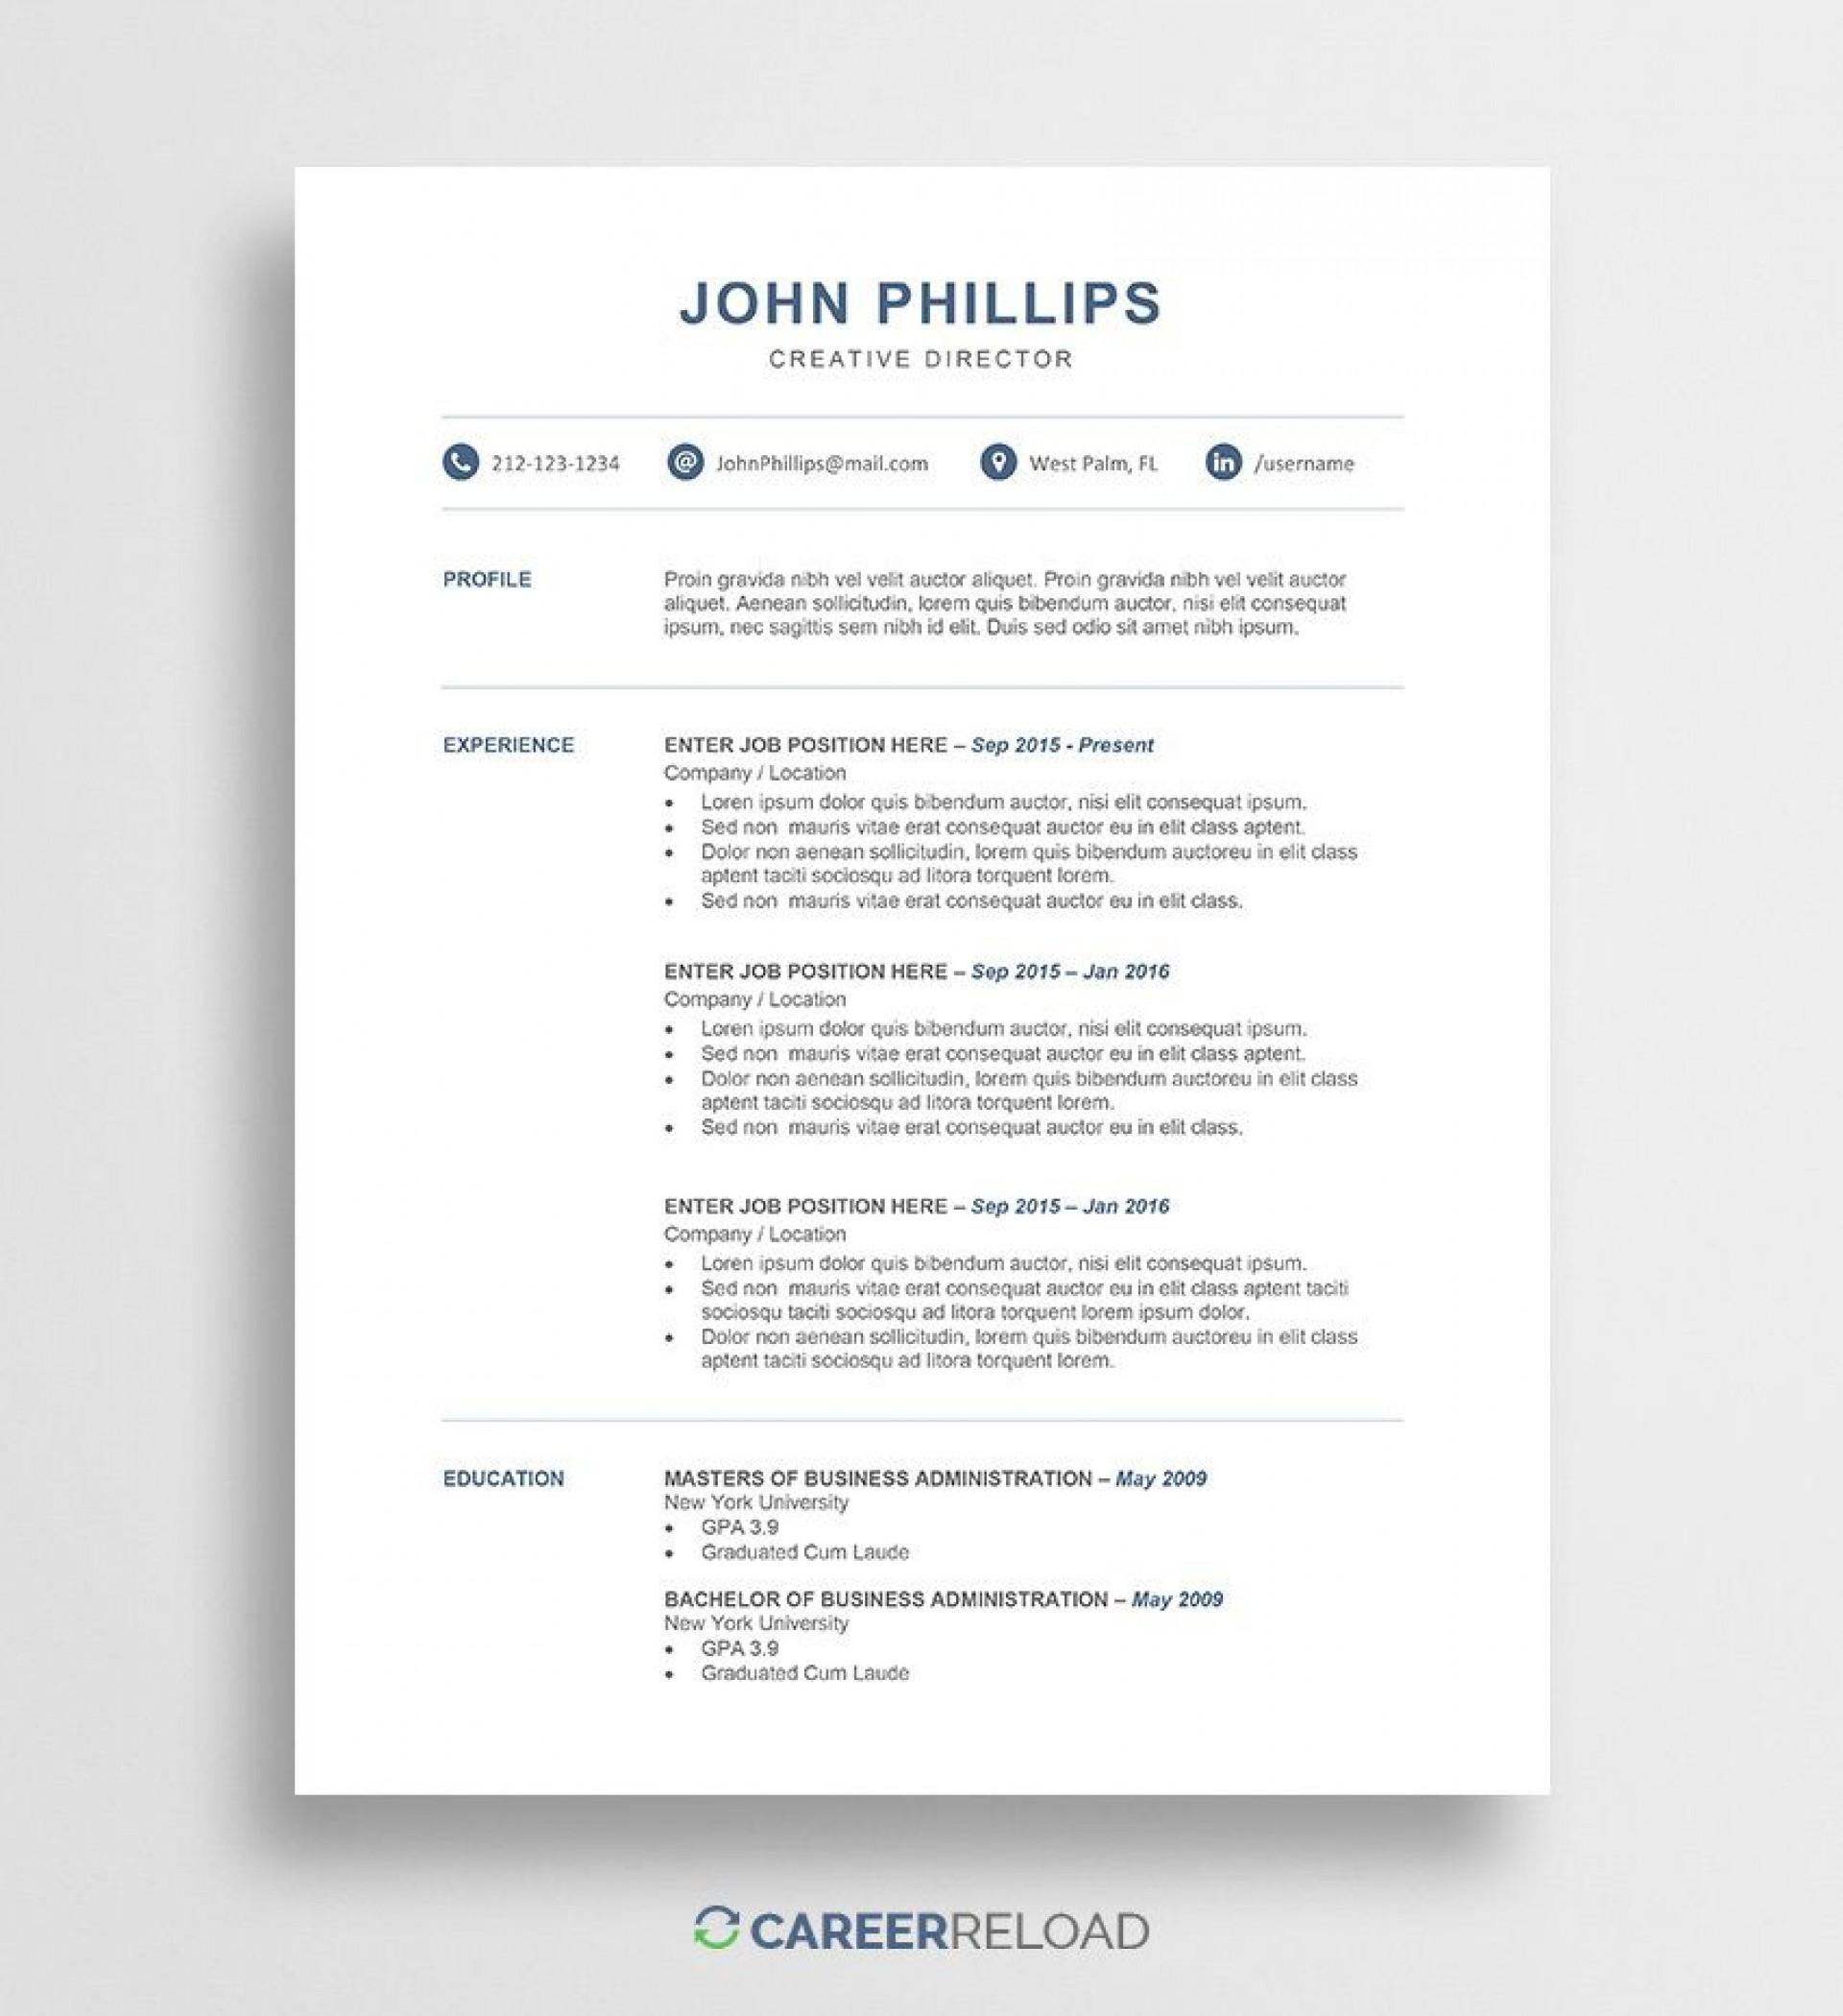 009 Wonderful Free Resume Template 2015 High Def 1920